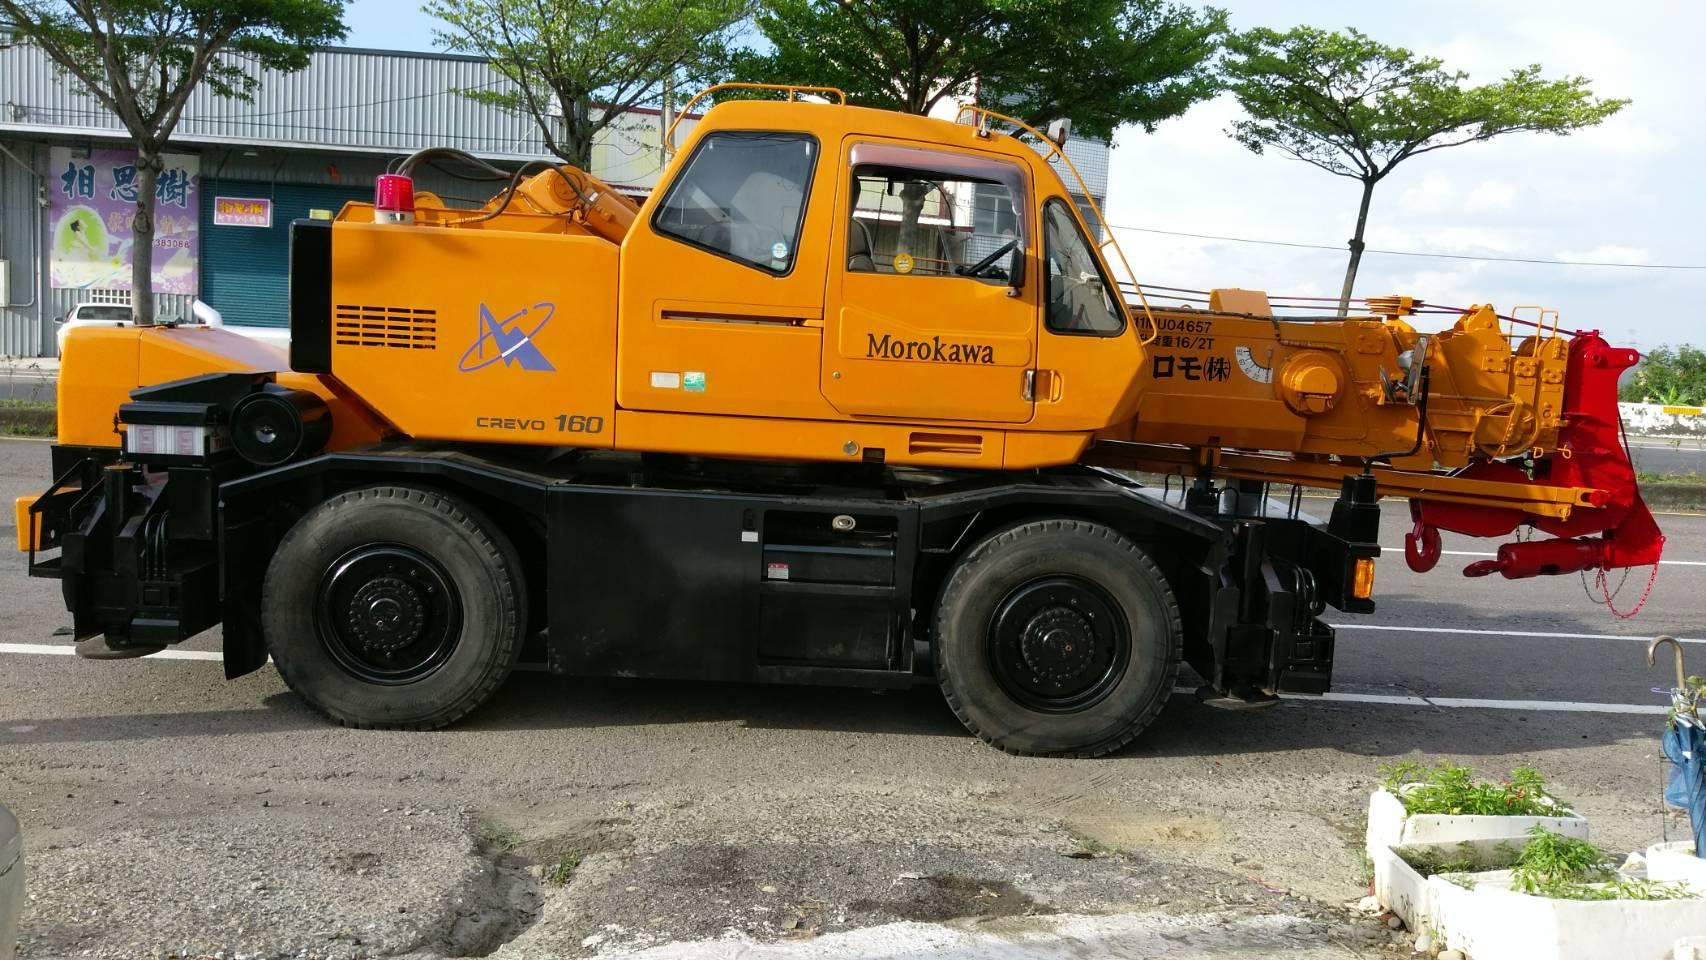 TADANO TR,160,M3 2000年份 -2.jpg